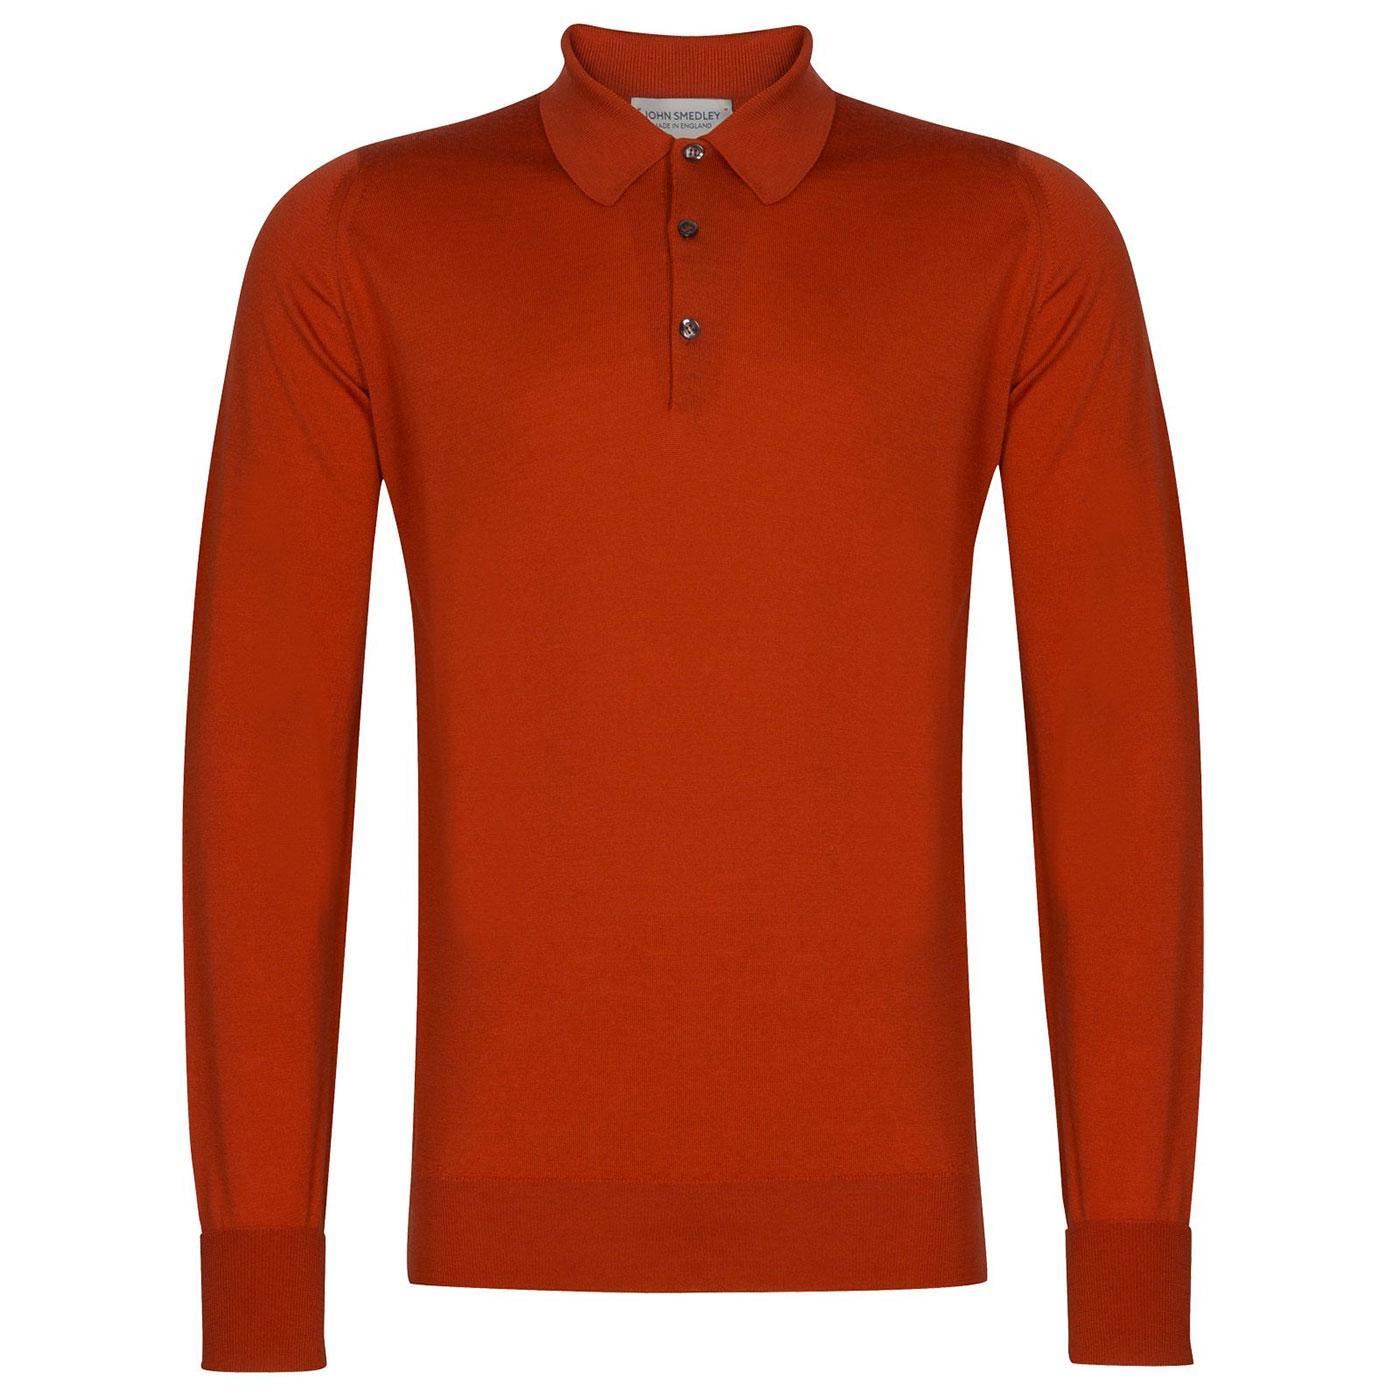 Dorset JOHN SMEDLEY Knitted Wool Mod Polo Shirt OV